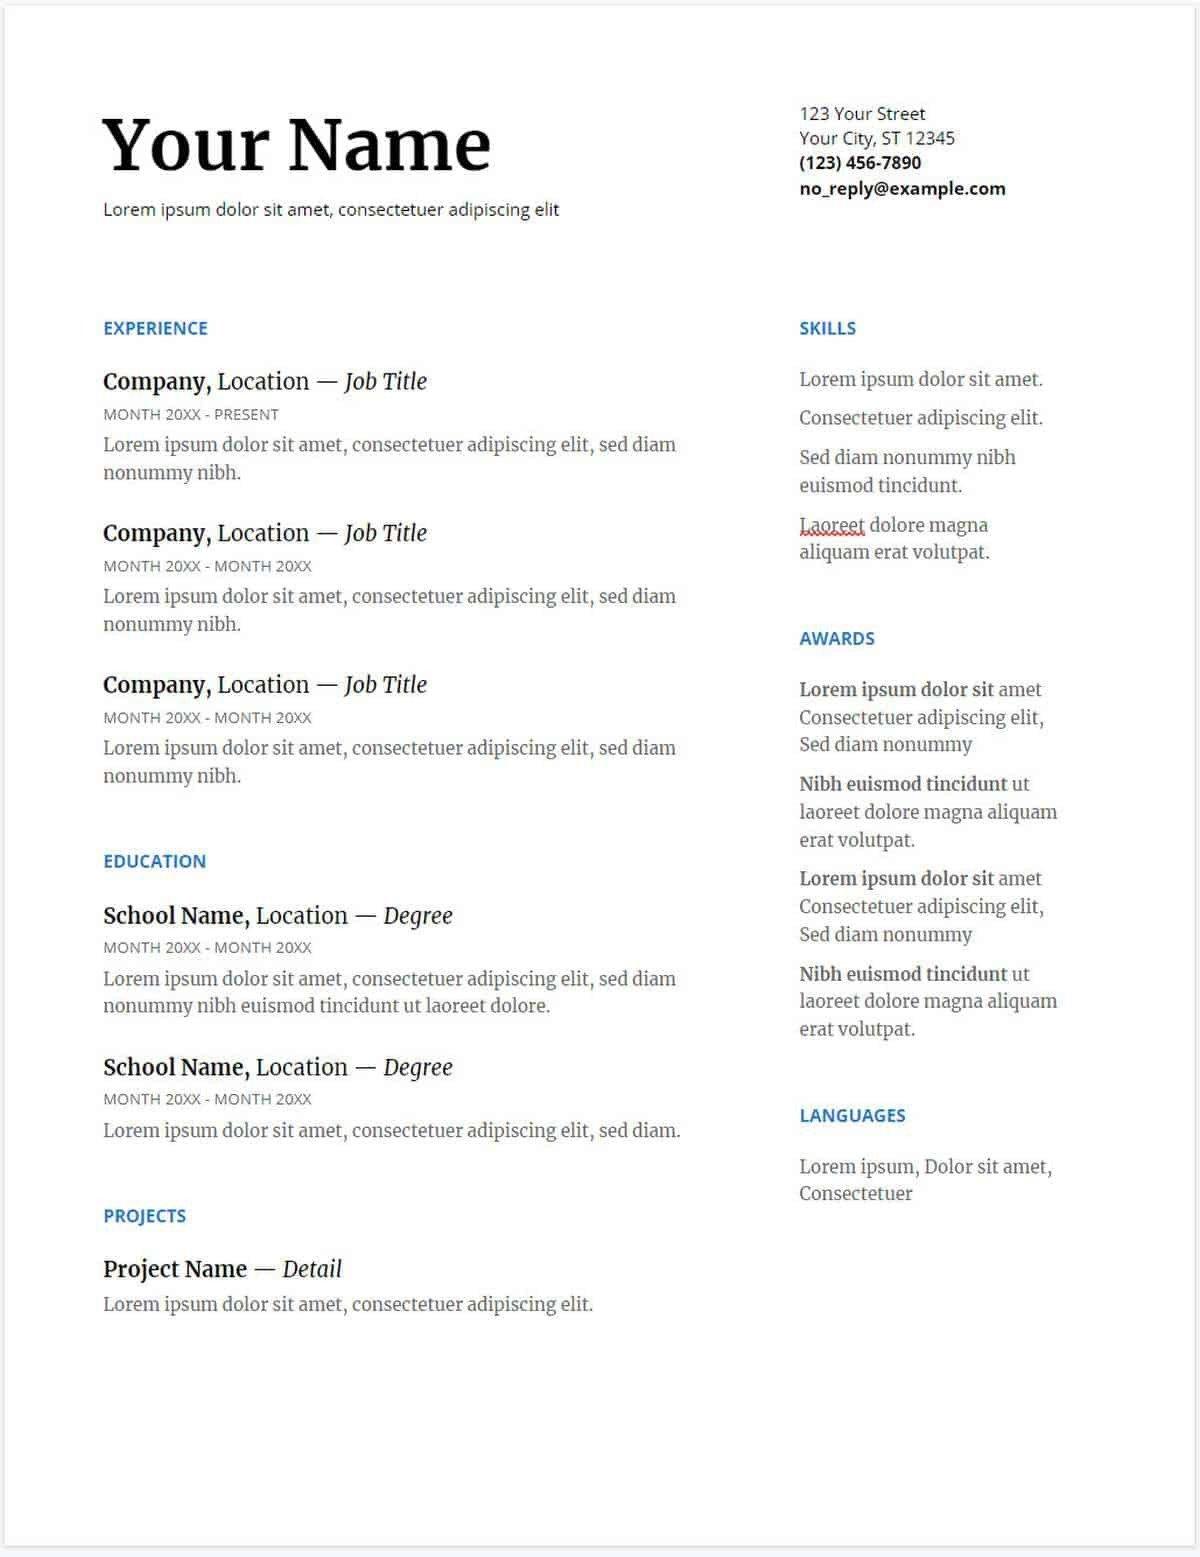 Free Google Docs Templates 30 Google Docs Resume Templates [downloadable Pdfs]